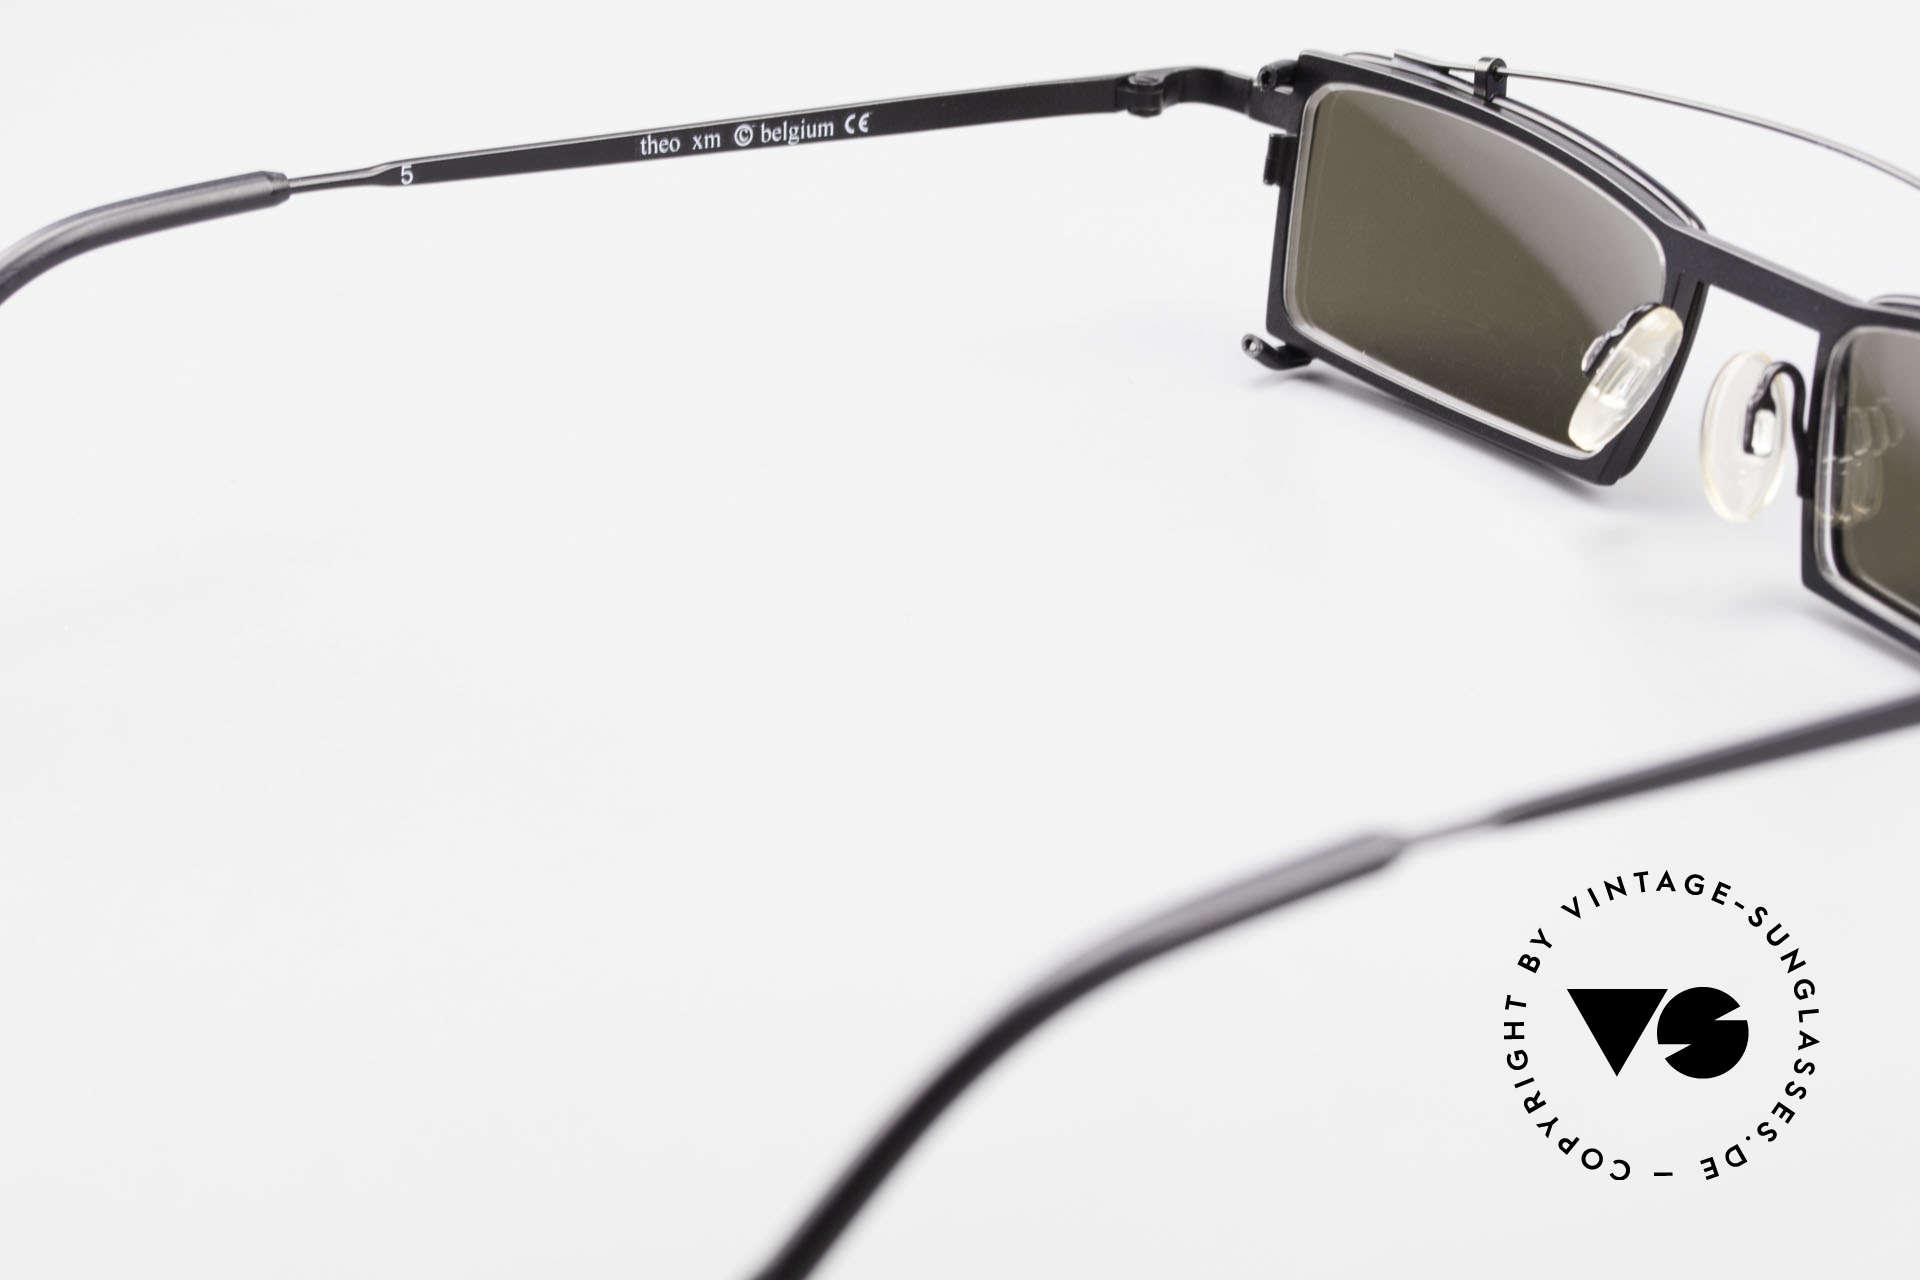 Theo Belgium XM Square Designer Frame Clip On, so to speak: vintage sunglasses with representativeness, Made for Men